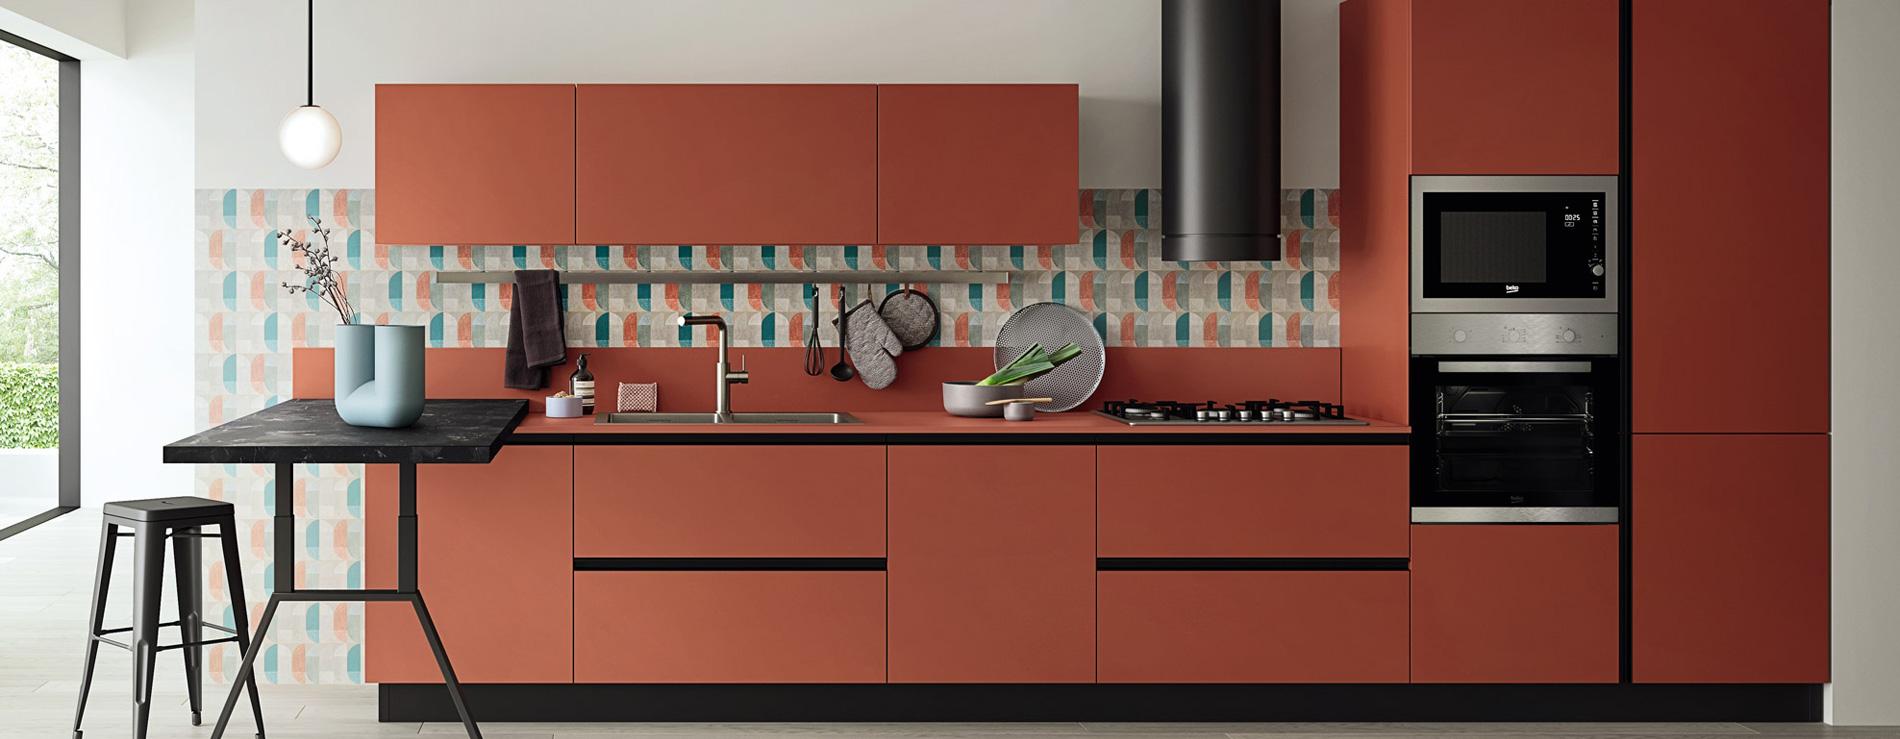 Cucina colore Matt | AR-DUE